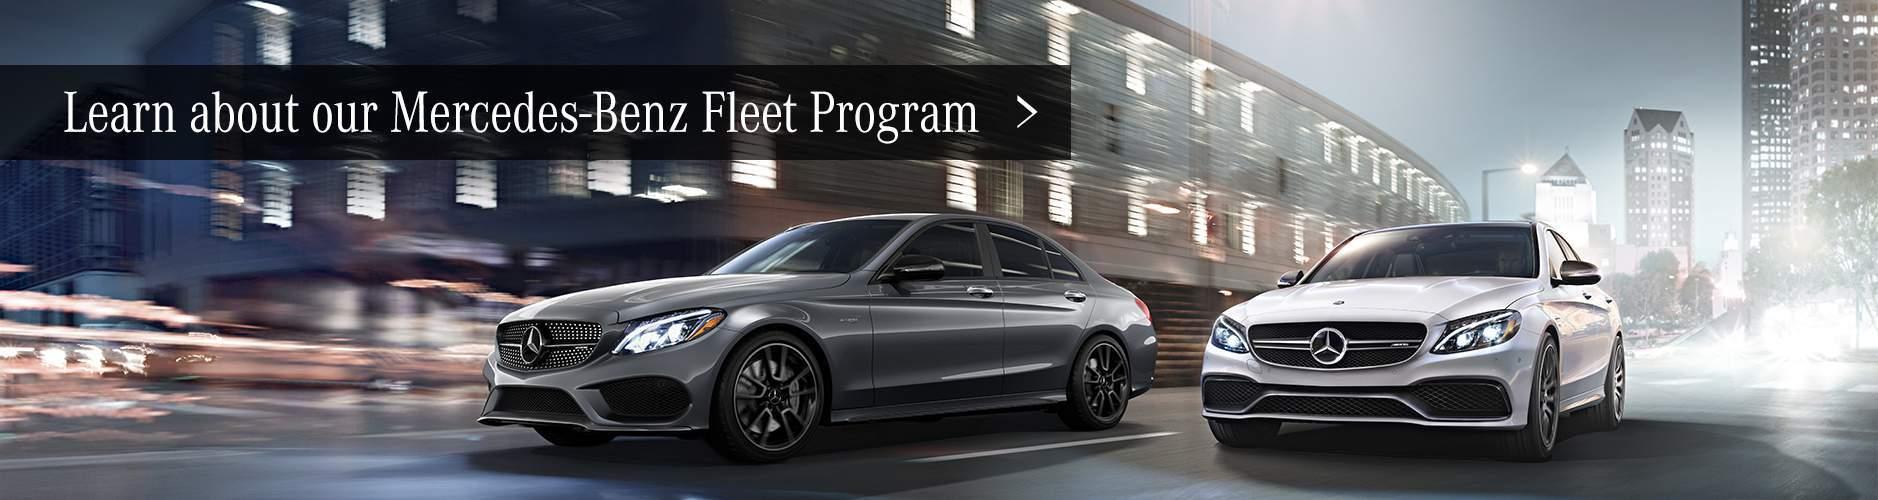 Mercedes benz dealership bronx ny fiat world test drive for Honda dealership bronx